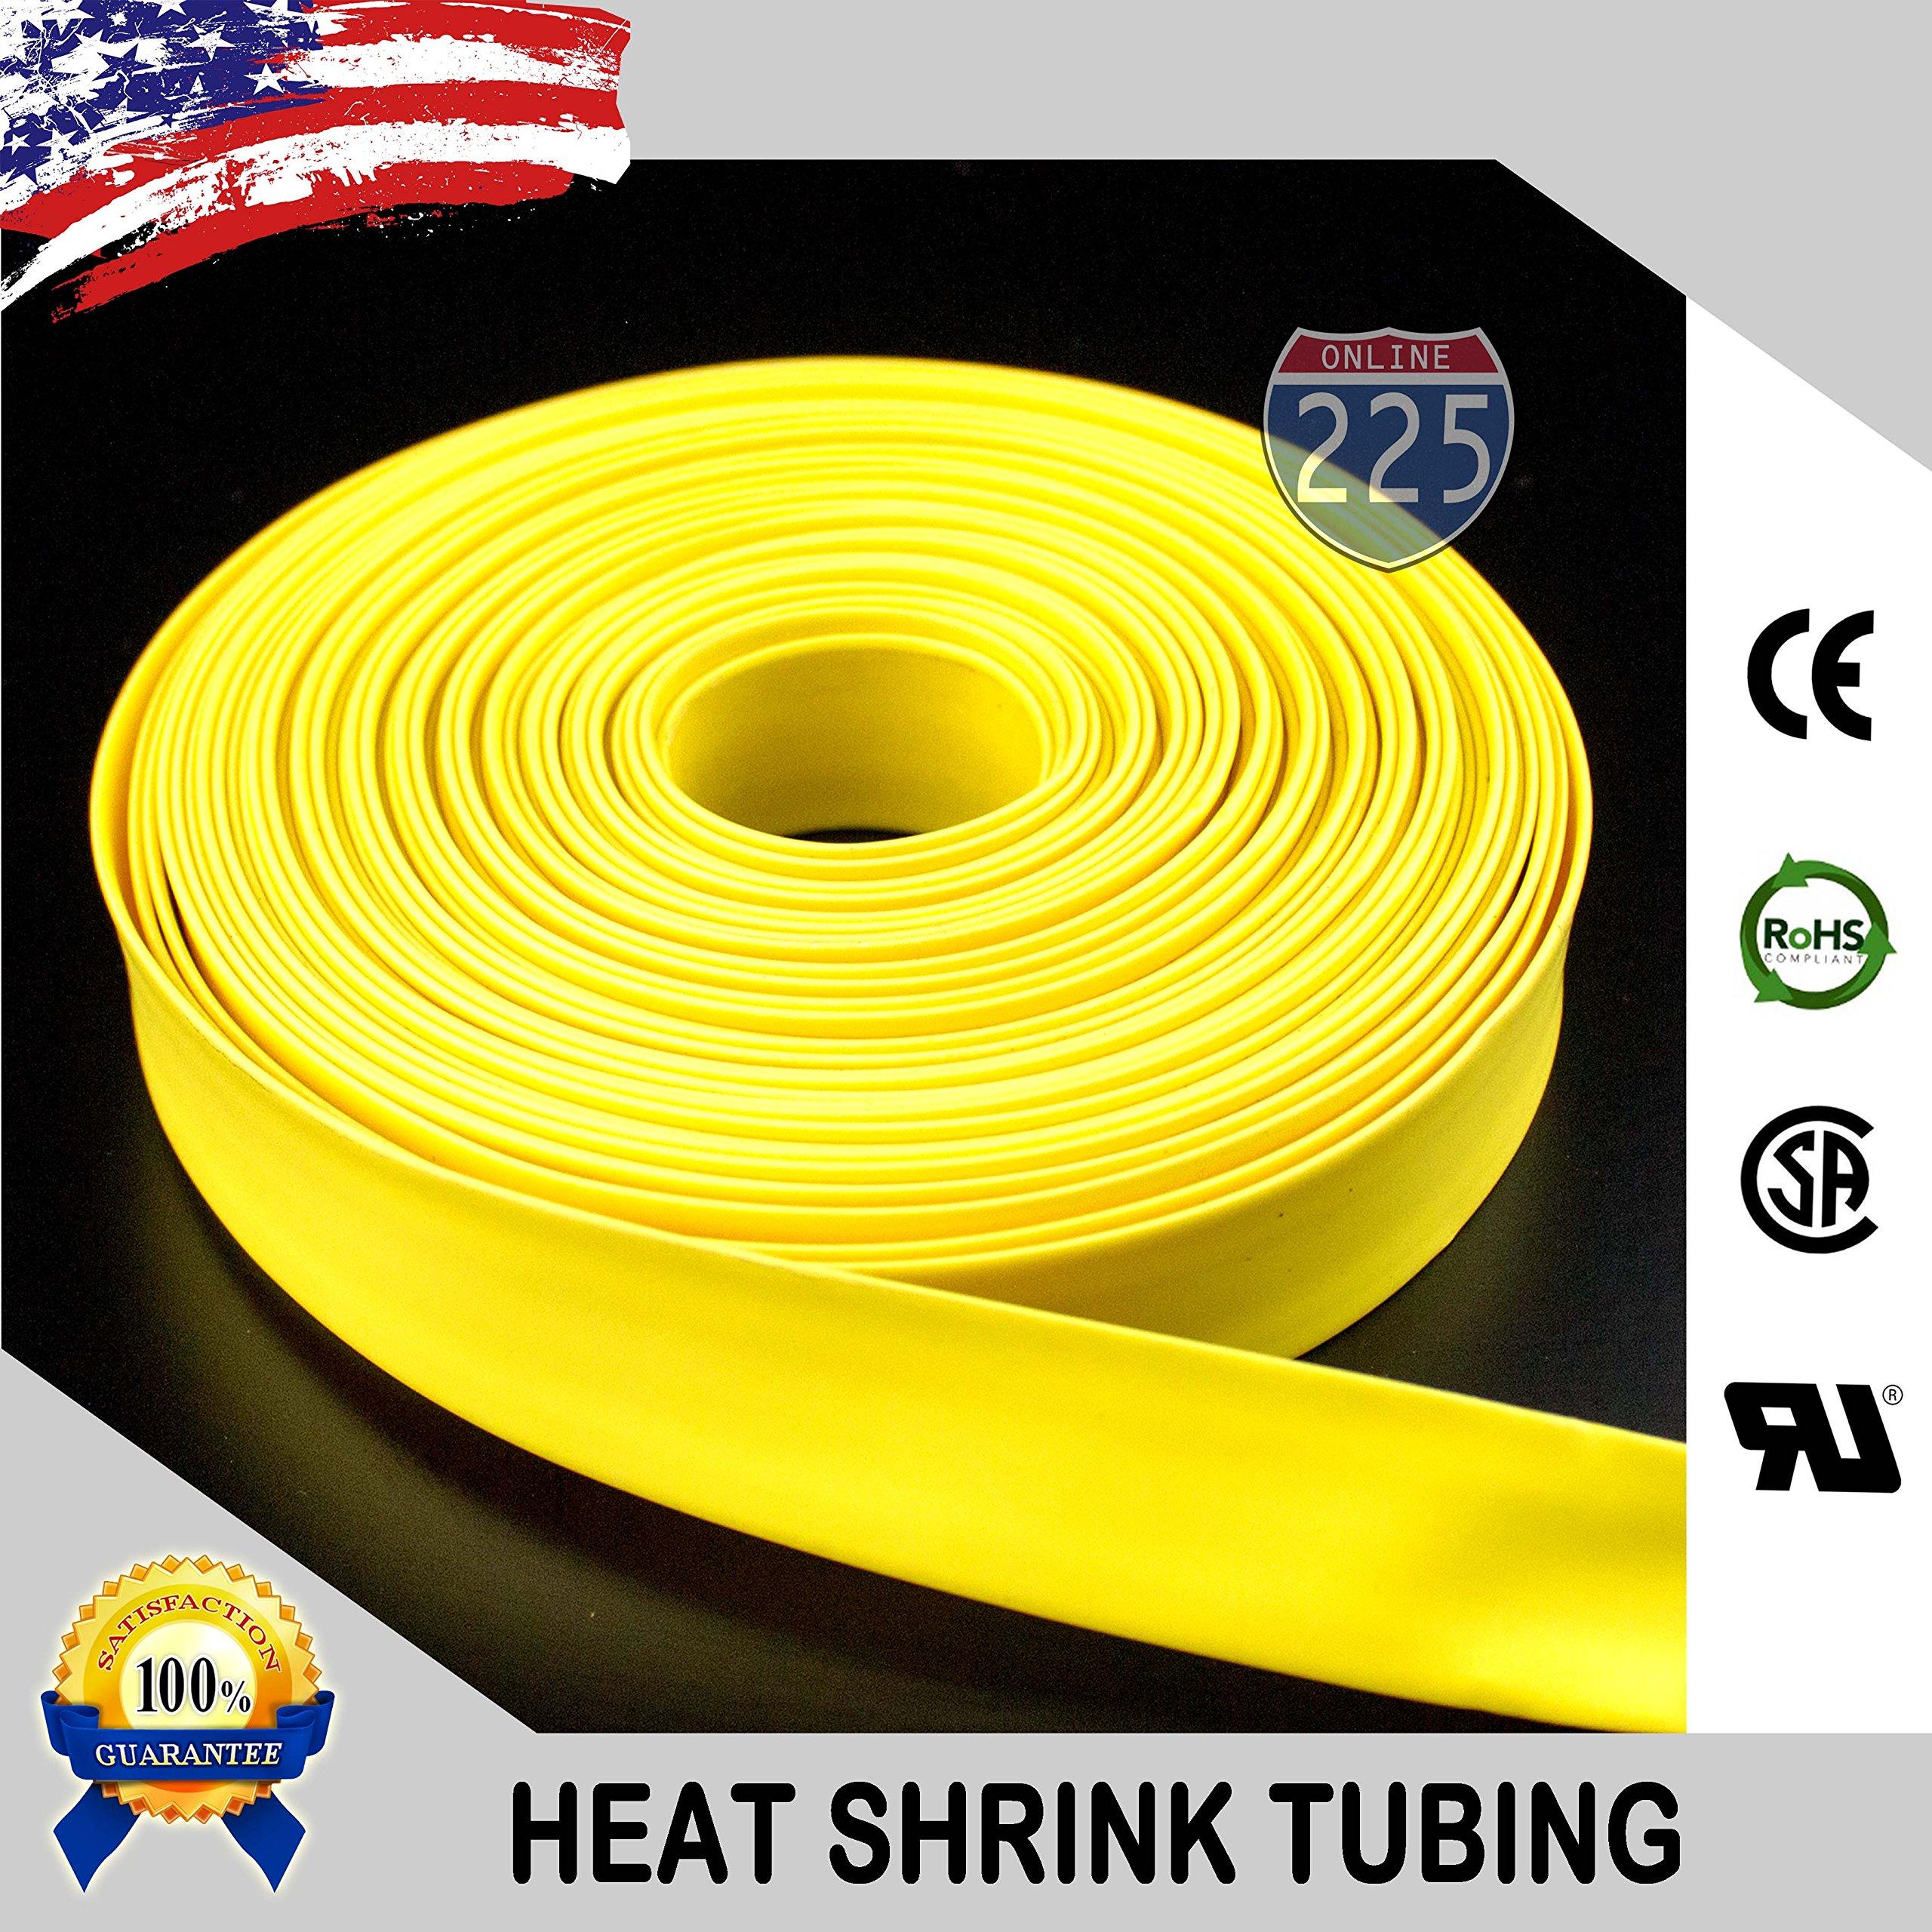 100 FT 1/2'' 13mm Polyolefin Yellow Heat Shrink Tubing 2:1 Ratio